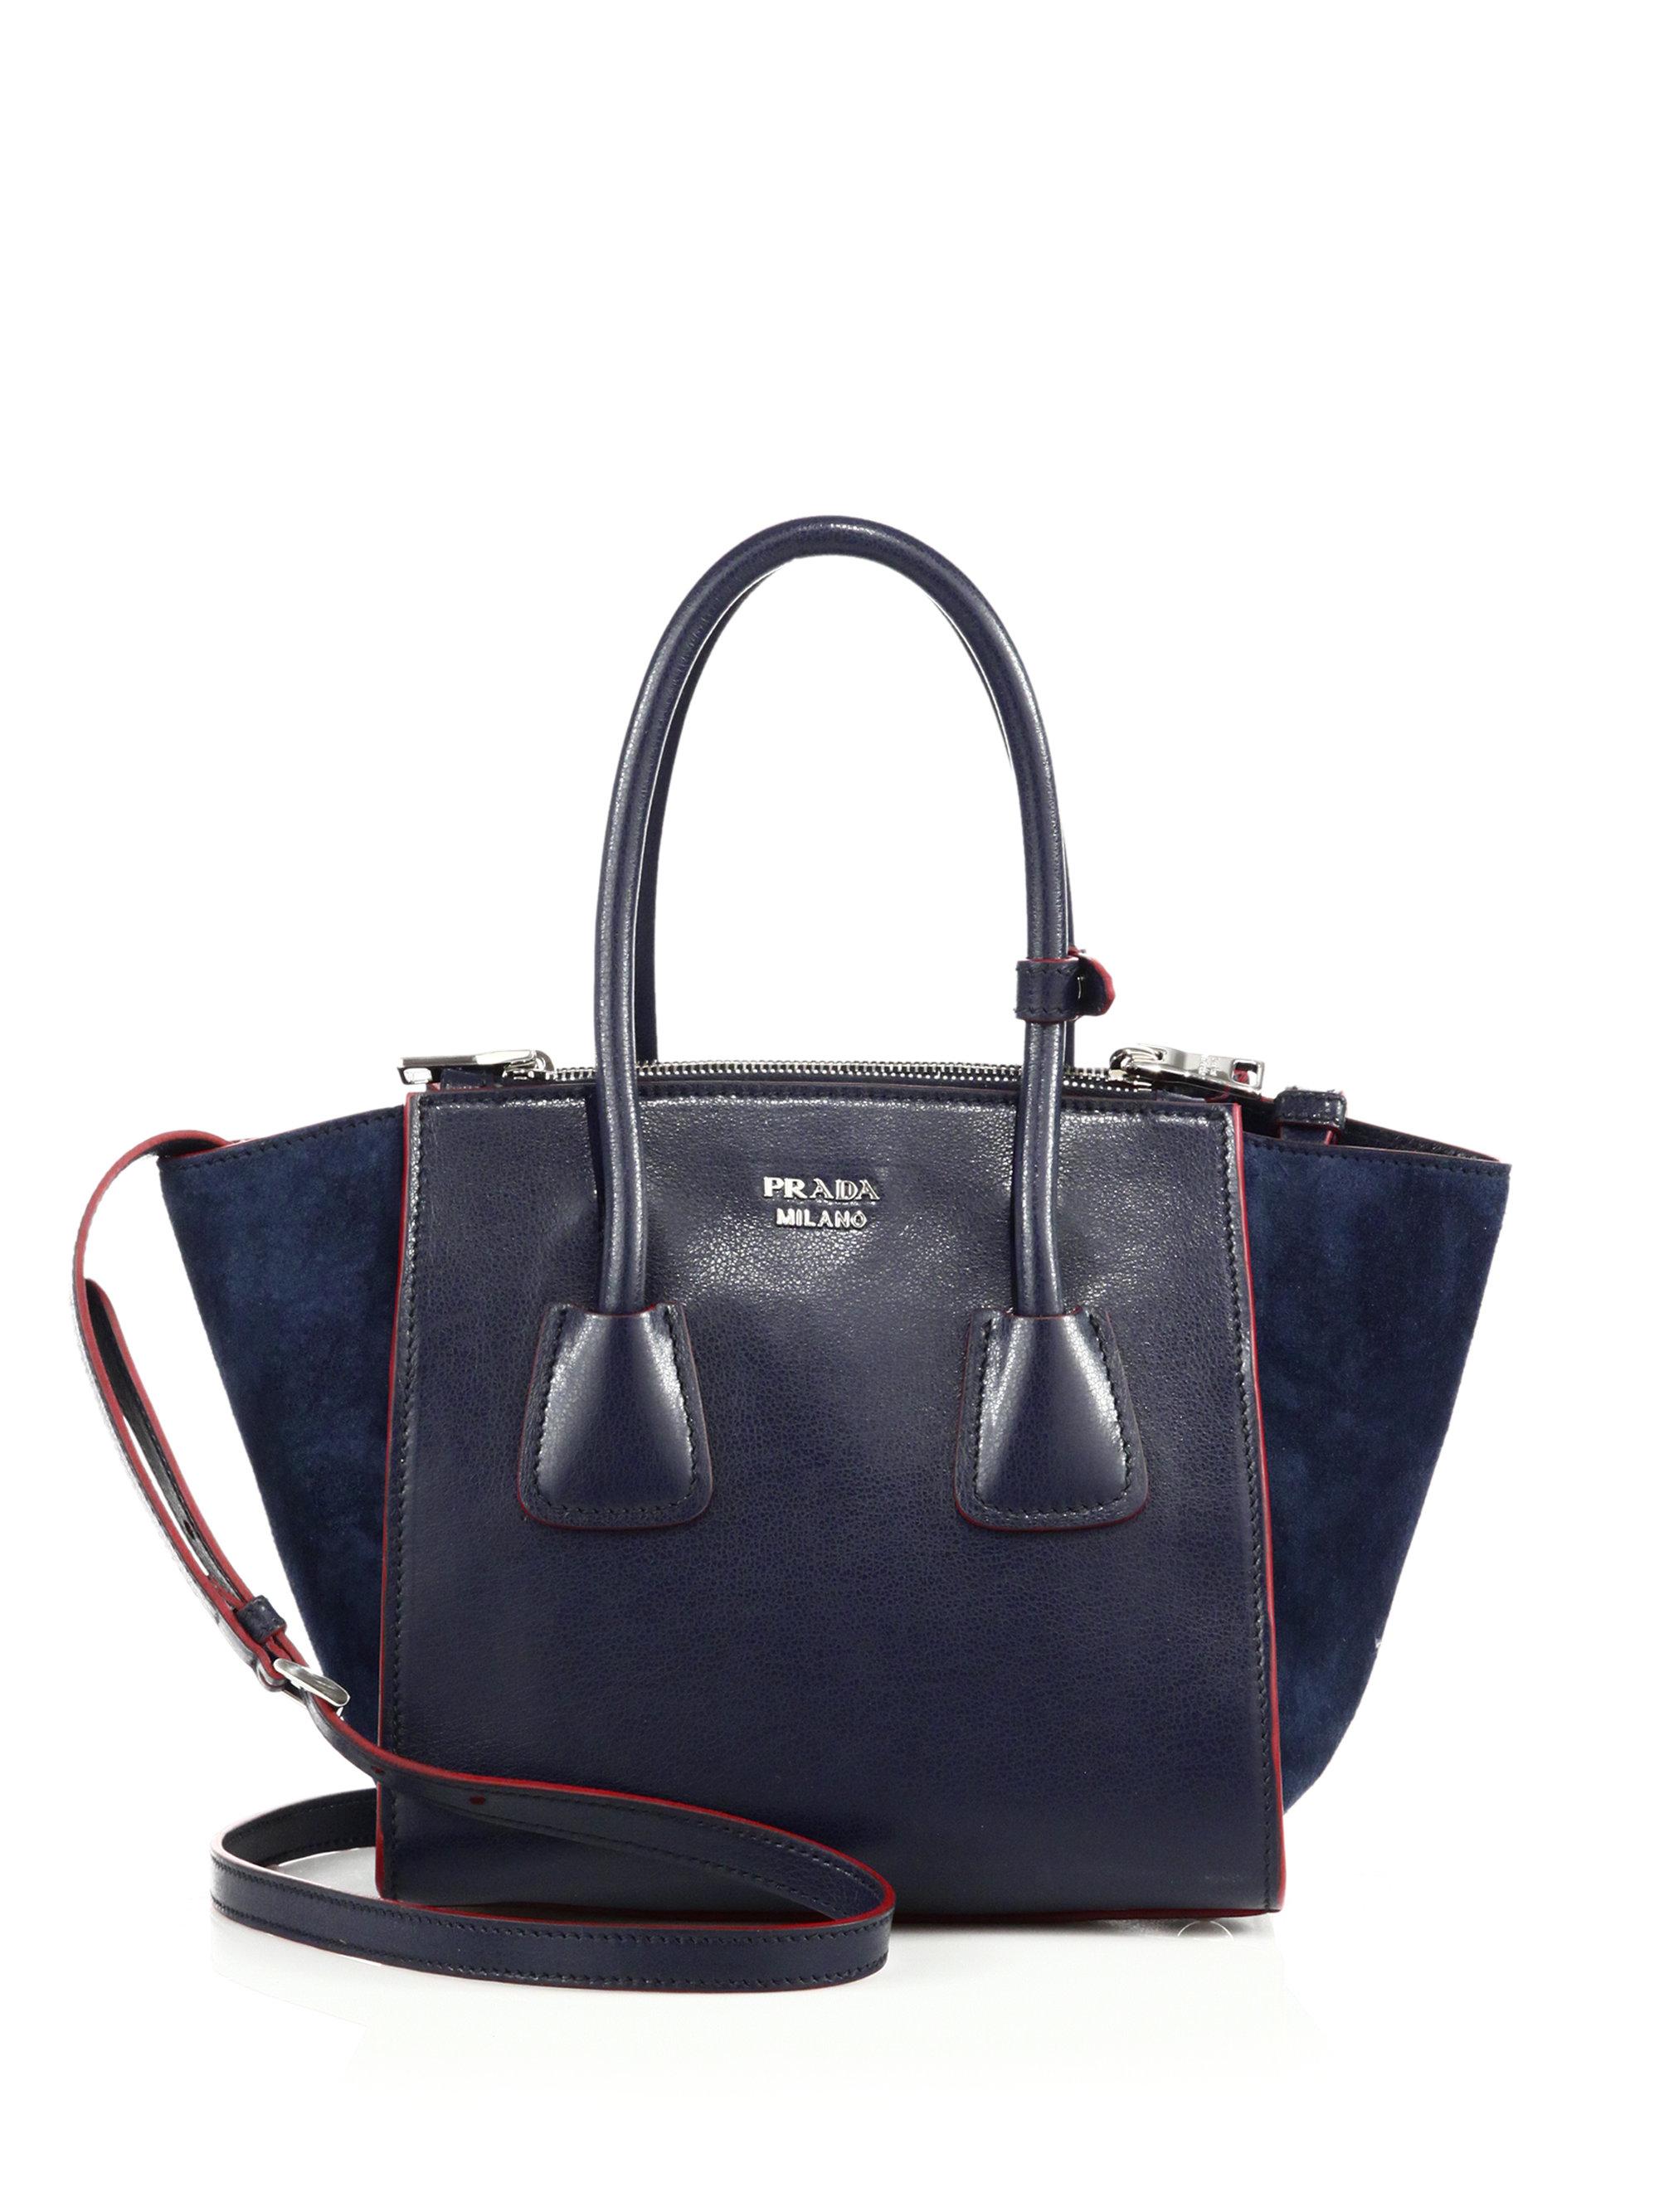 hot prada textured leather shoulder bag d99b4 624d3  buy prada twin pocket  tote bag b598b 92ef3 d512c4abc0